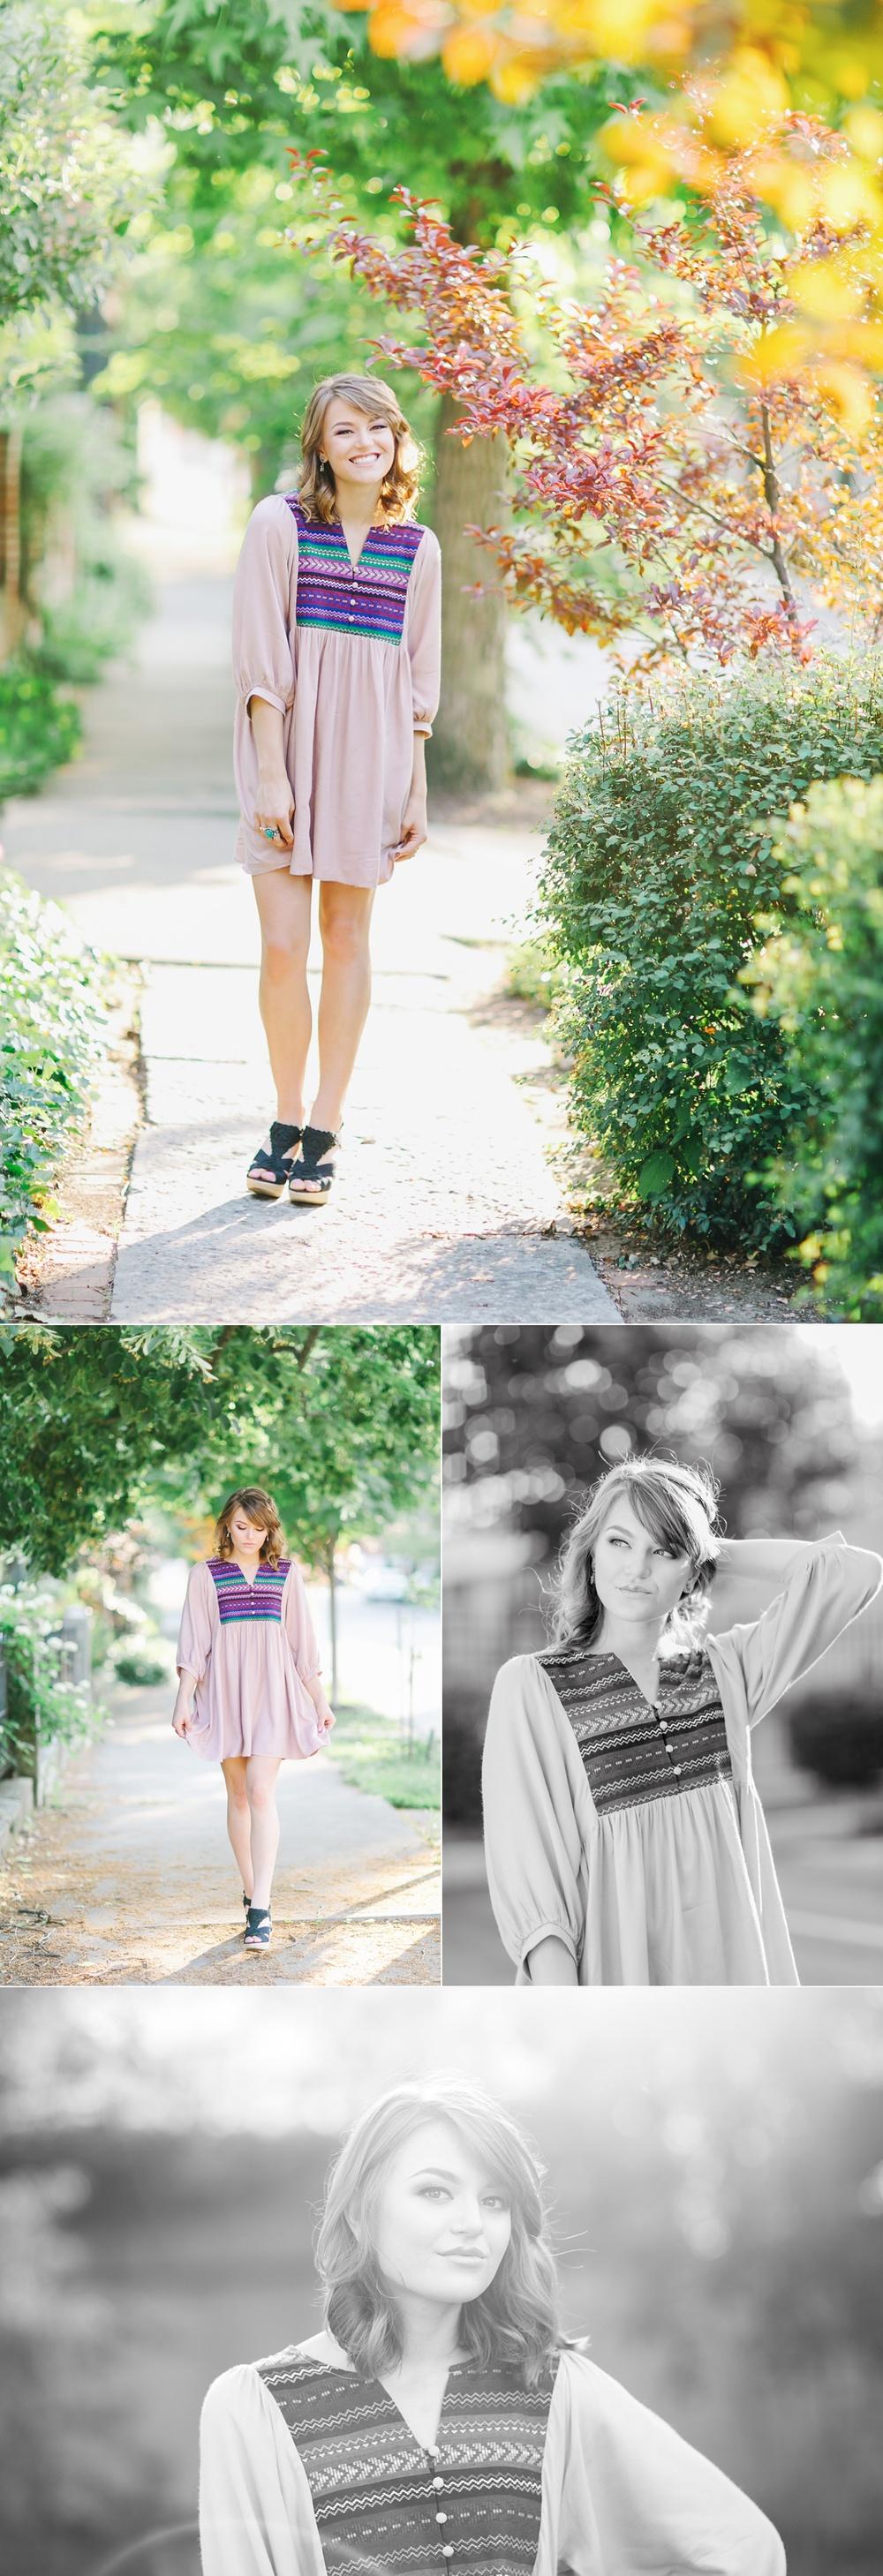 Dayton-Senior-Photography-Lux-Senior-Photography-01.jpg